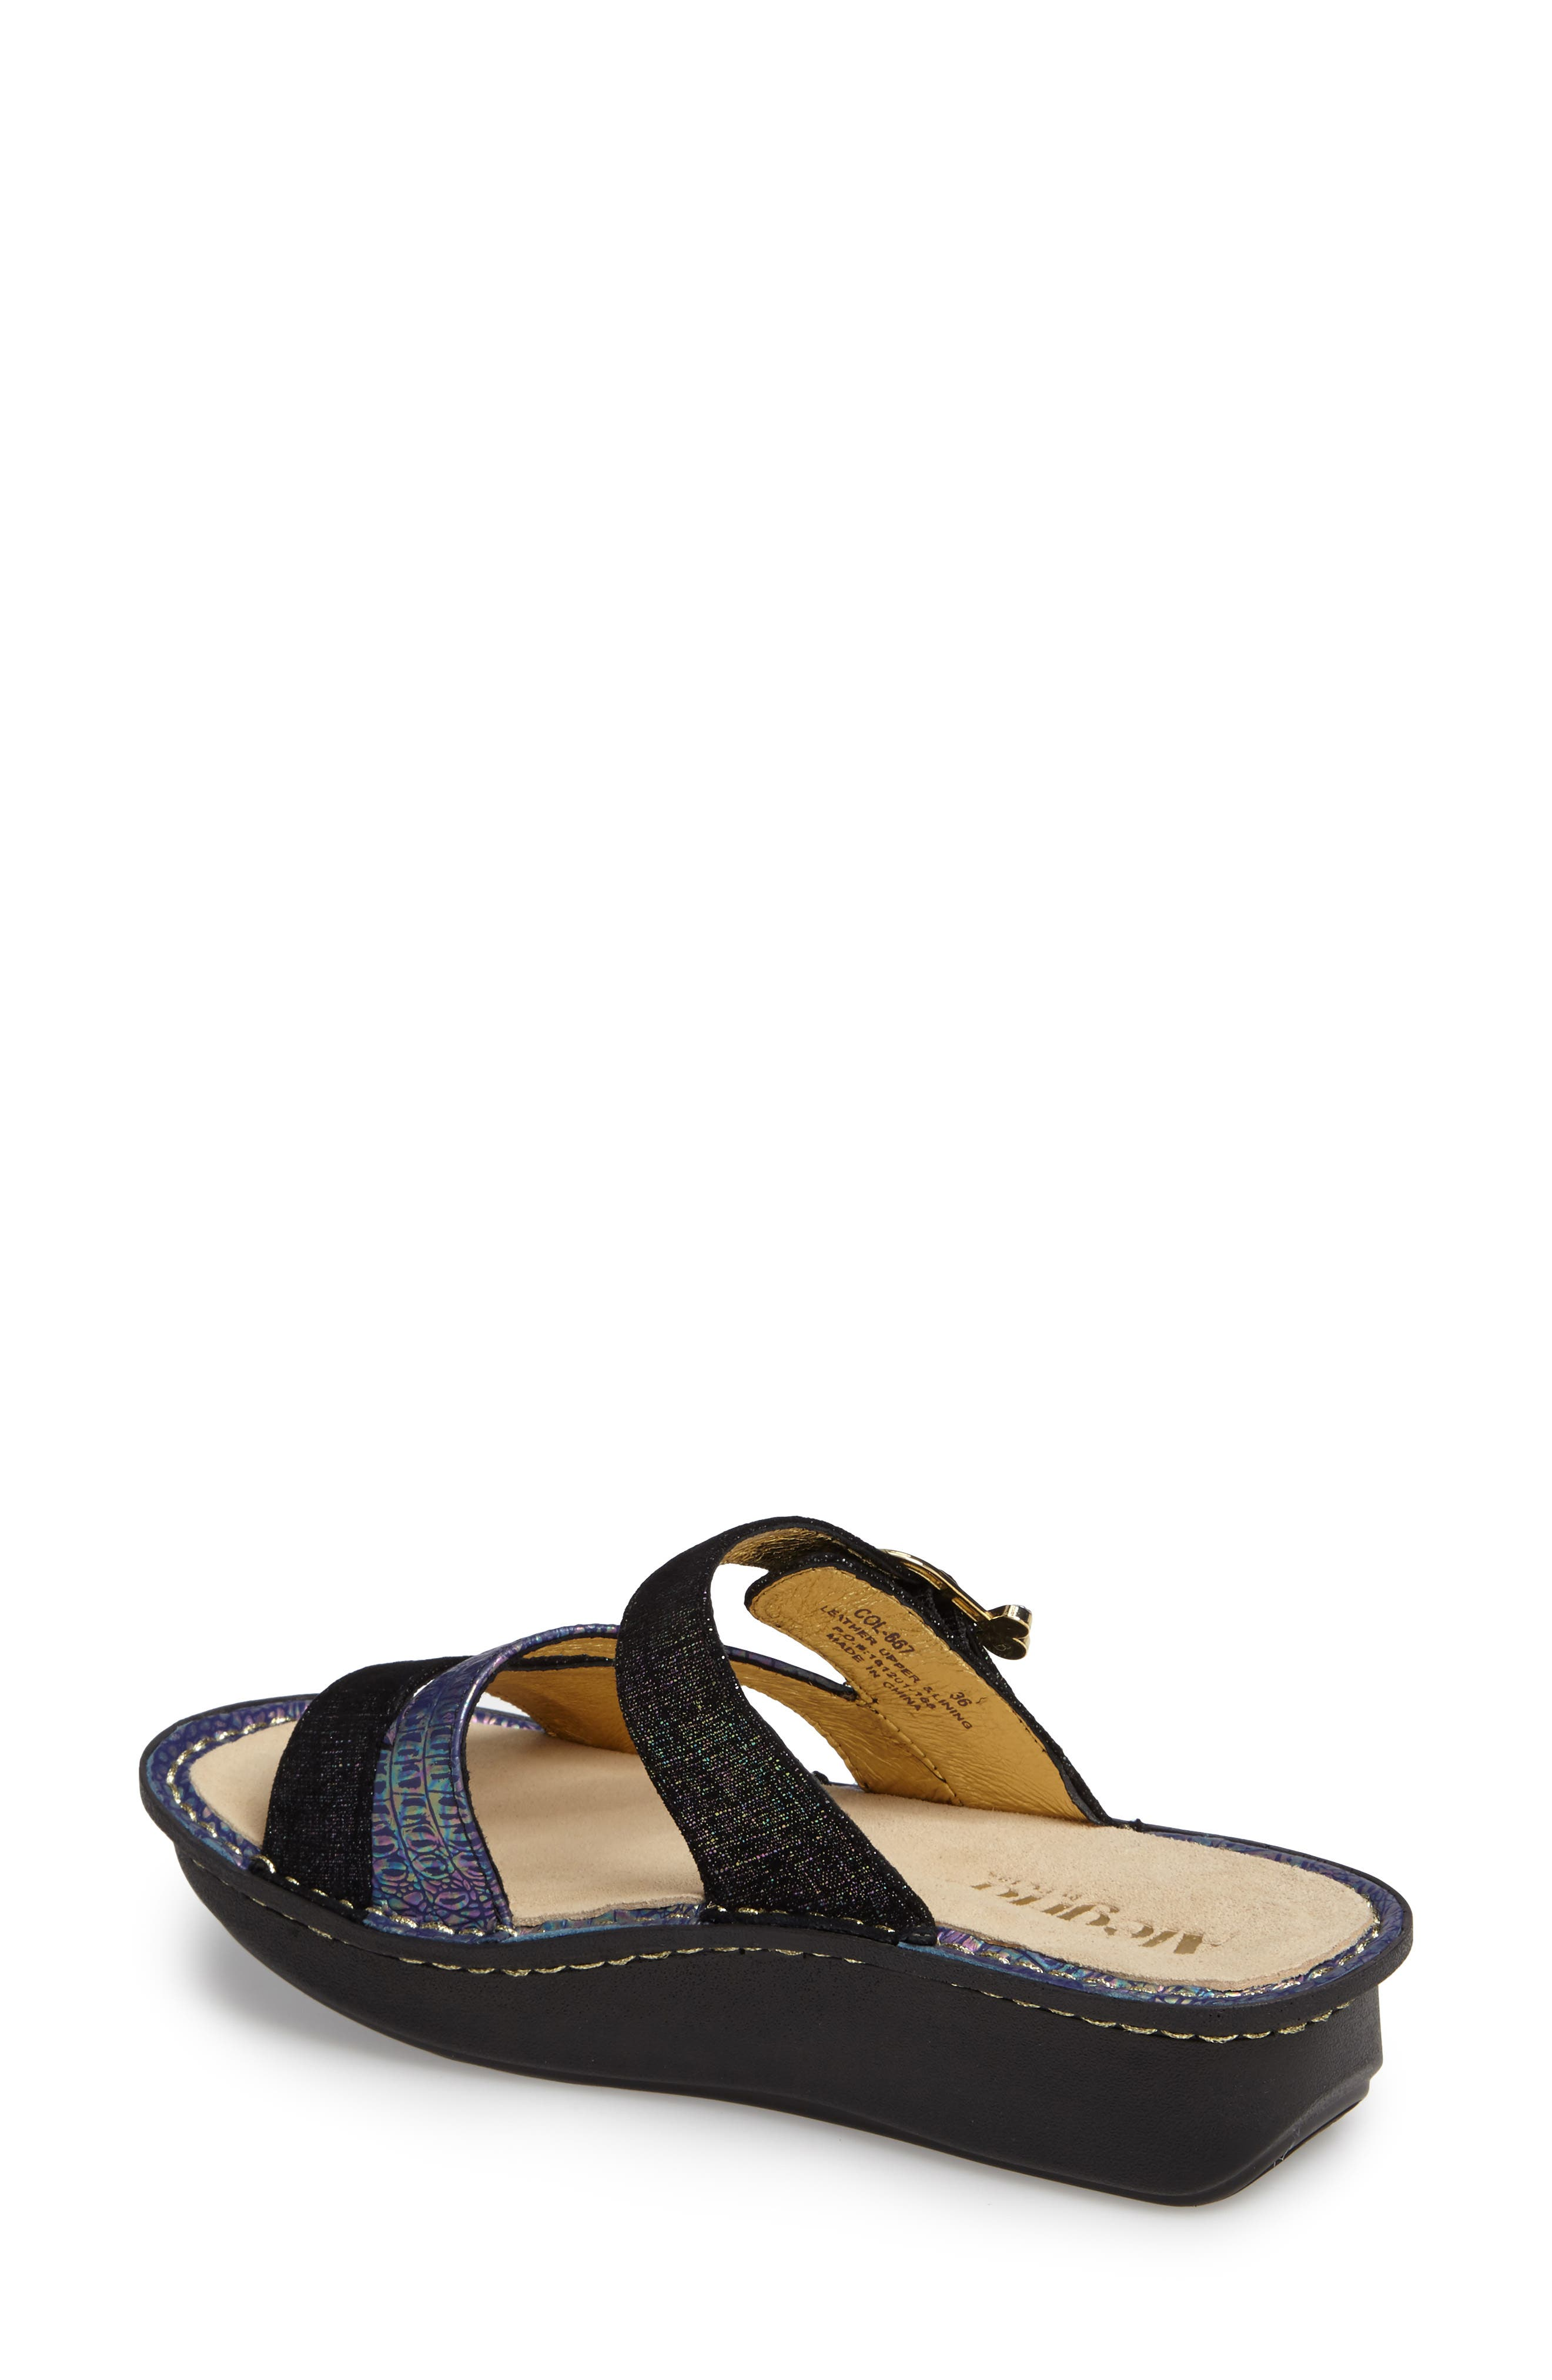 'Colette' Platform Sandal,                             Alternate thumbnail 28, color,